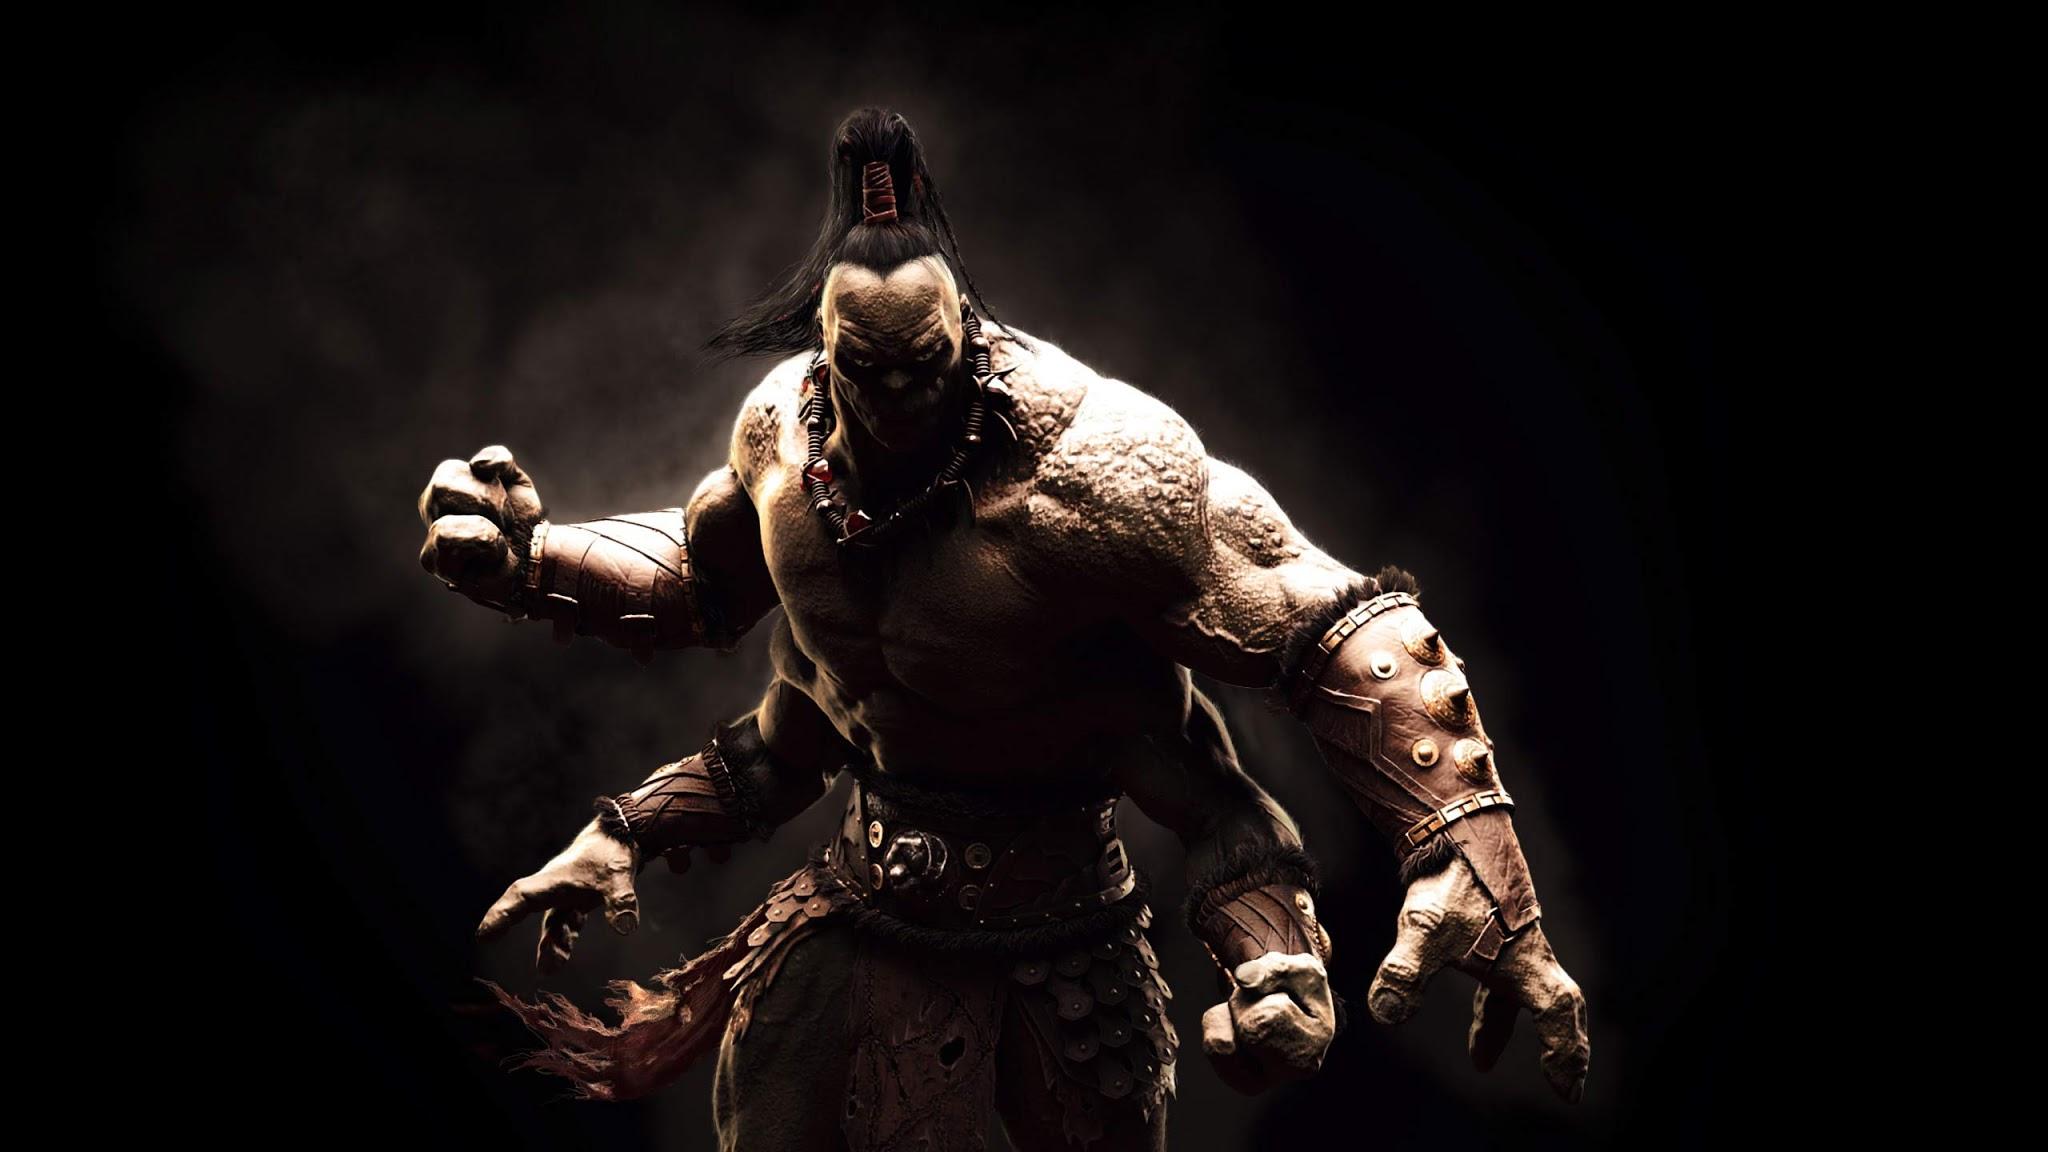 Descargar Mortal Kombat 6 Gratis Para Pc | hoddlibuco gq